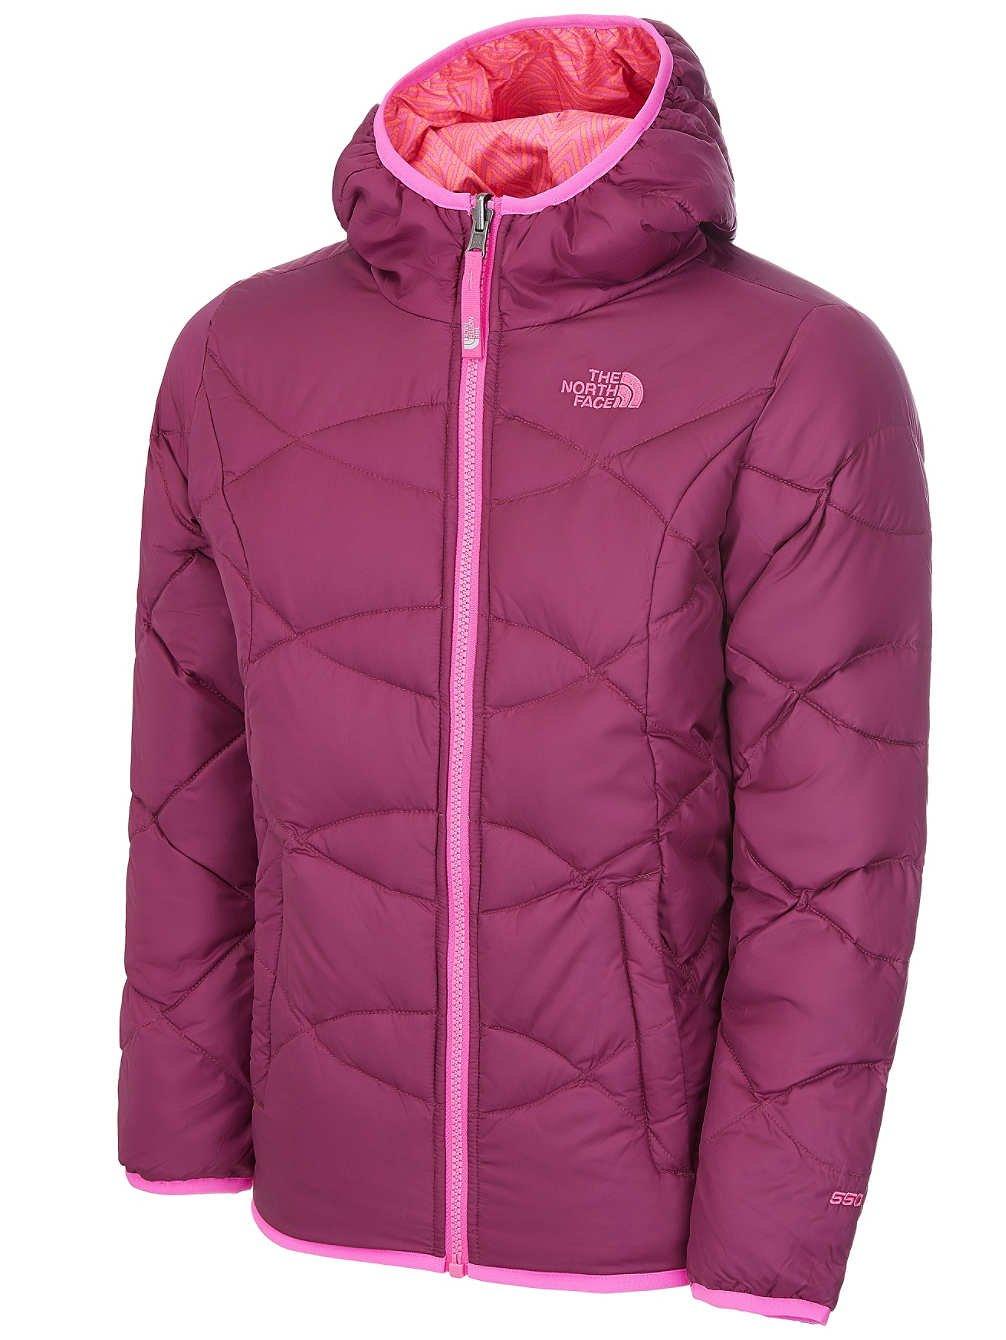 The North Face Girls Reversible Moondoggy Jacket CHB3N6P_YS